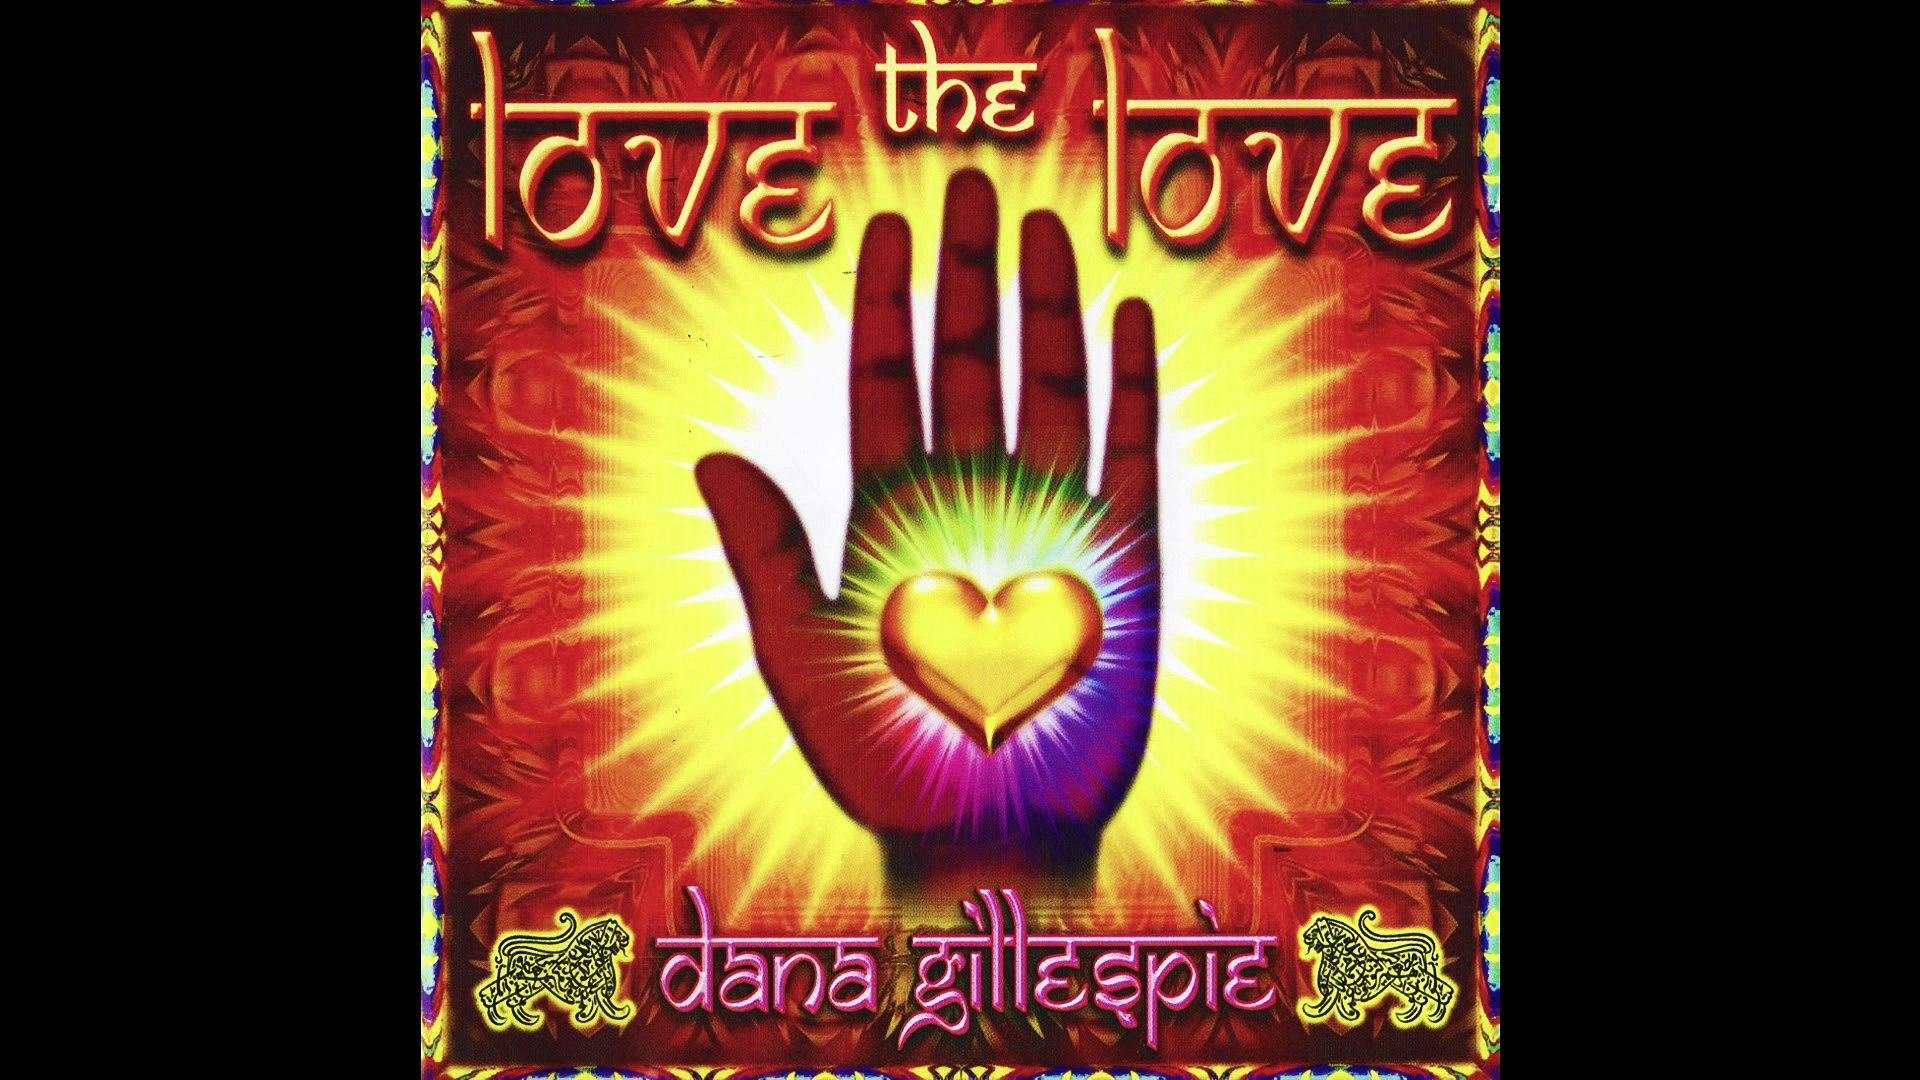 Dana Gillespie - Love is the way - Love the love